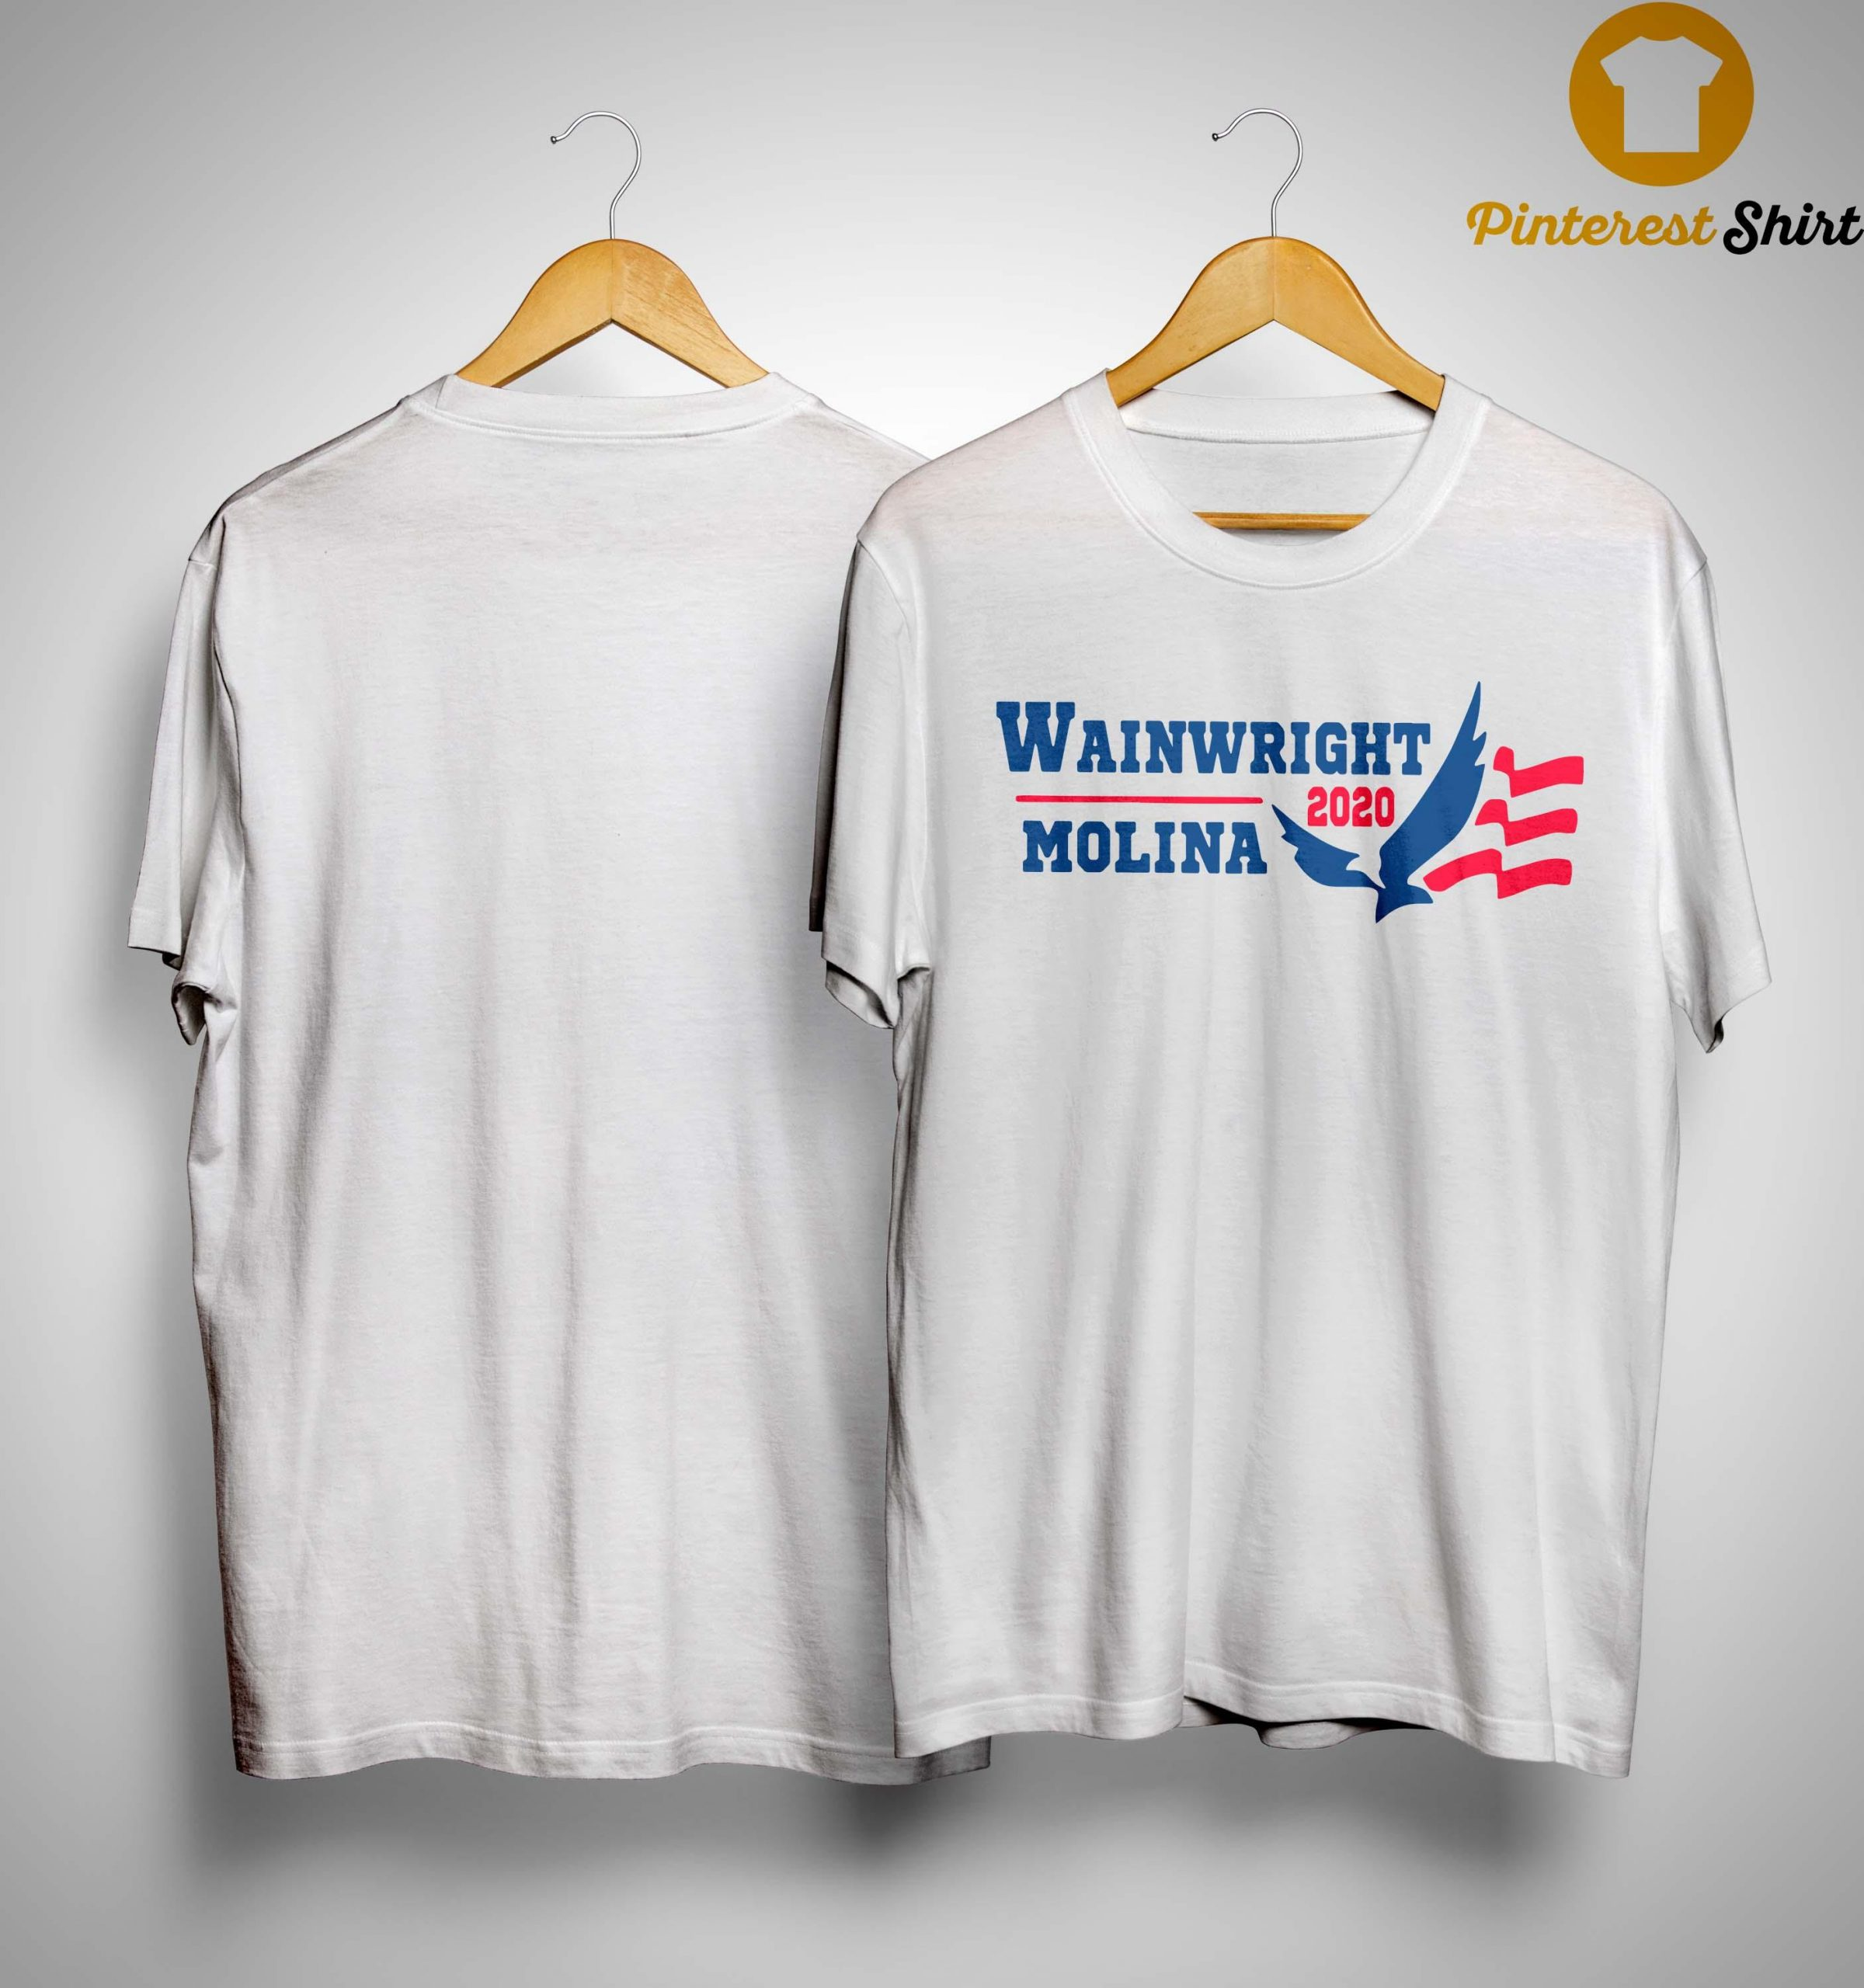 Wainwright Molina 2020 Tee Shirt